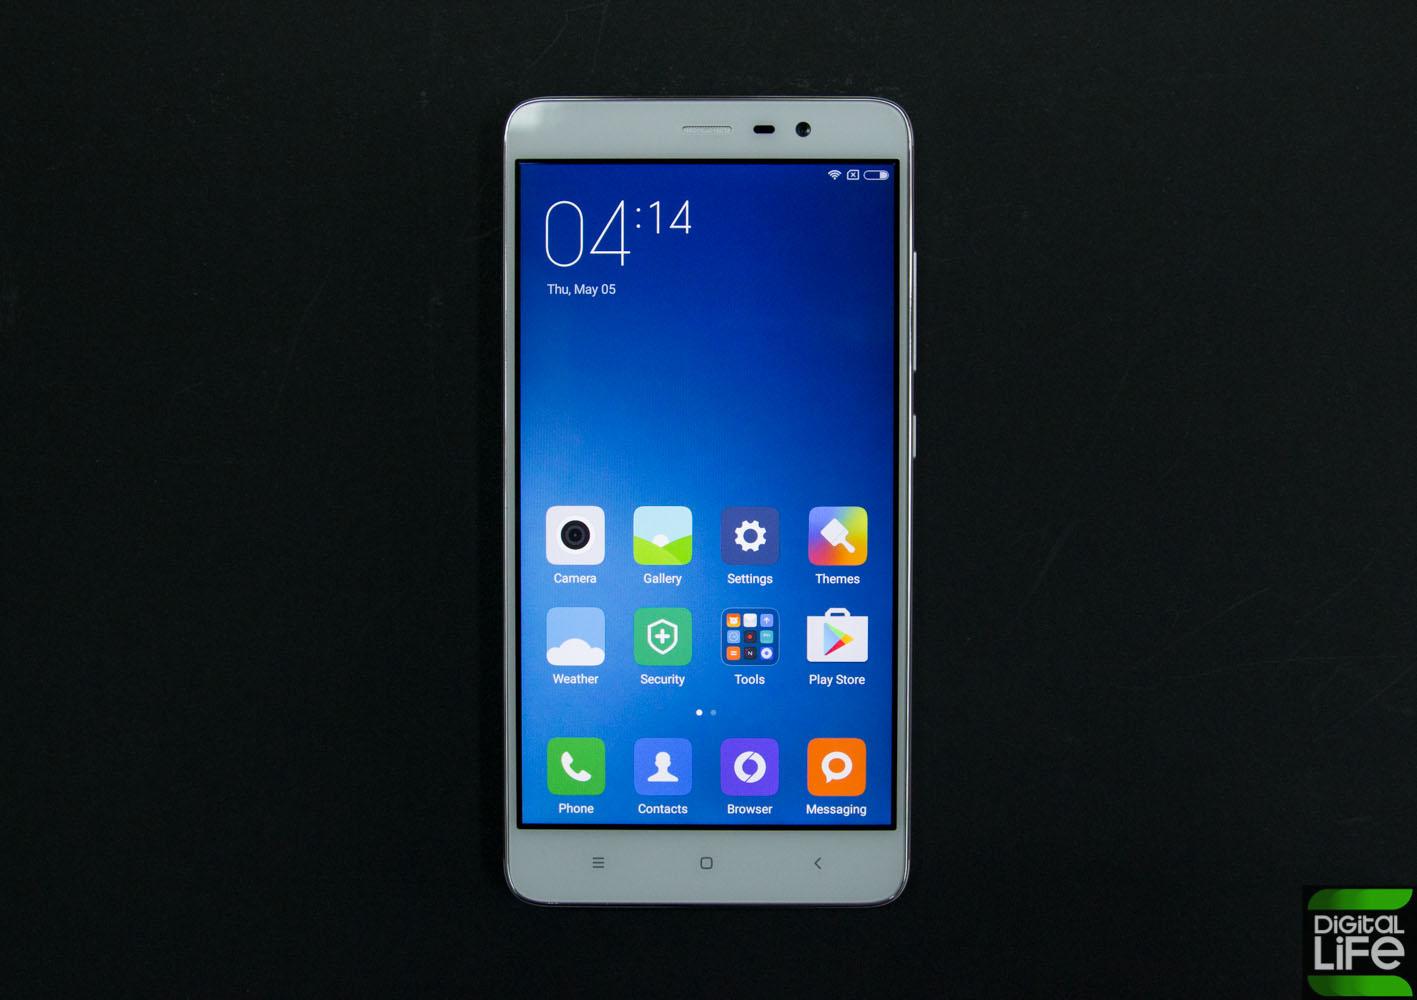 Wallpaper Hd Xiaomi Redmi Note 3: Xiaomi Redmi Note 3 Hands-On Review: «H Xiaomi ανεβάζει